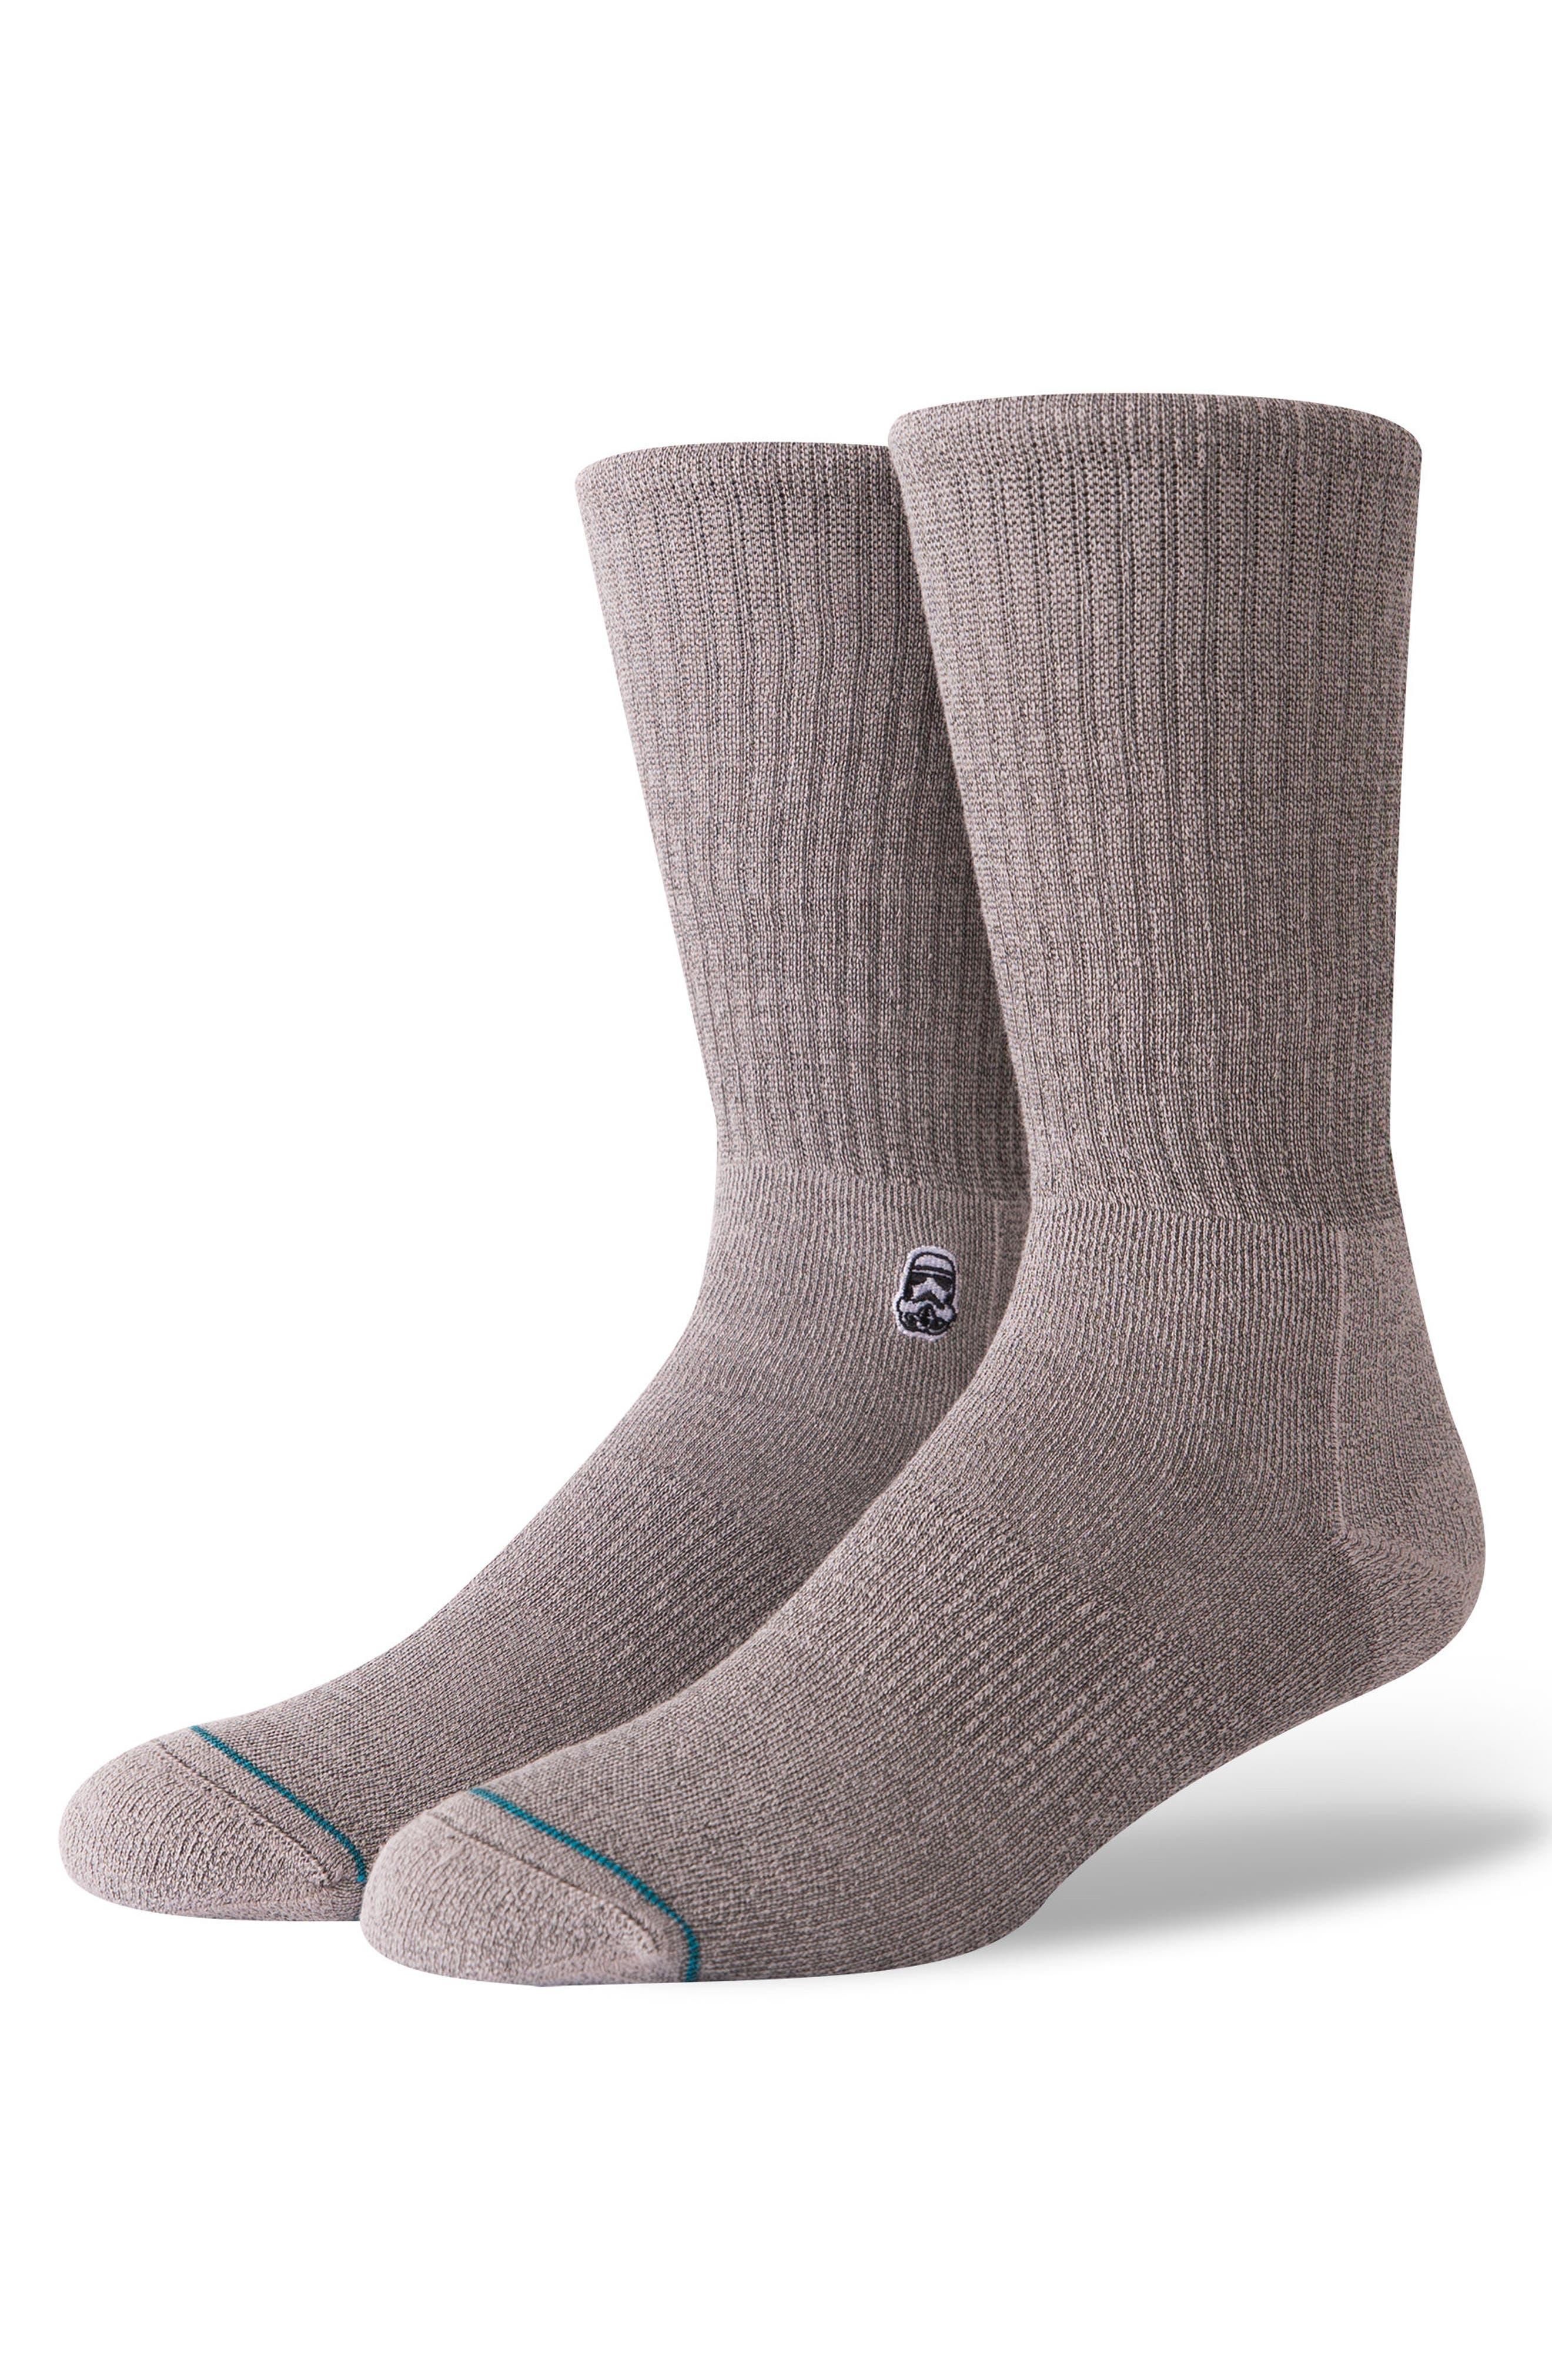 Star Wars Solid Trooper Socks,                         Main,                         color, Black